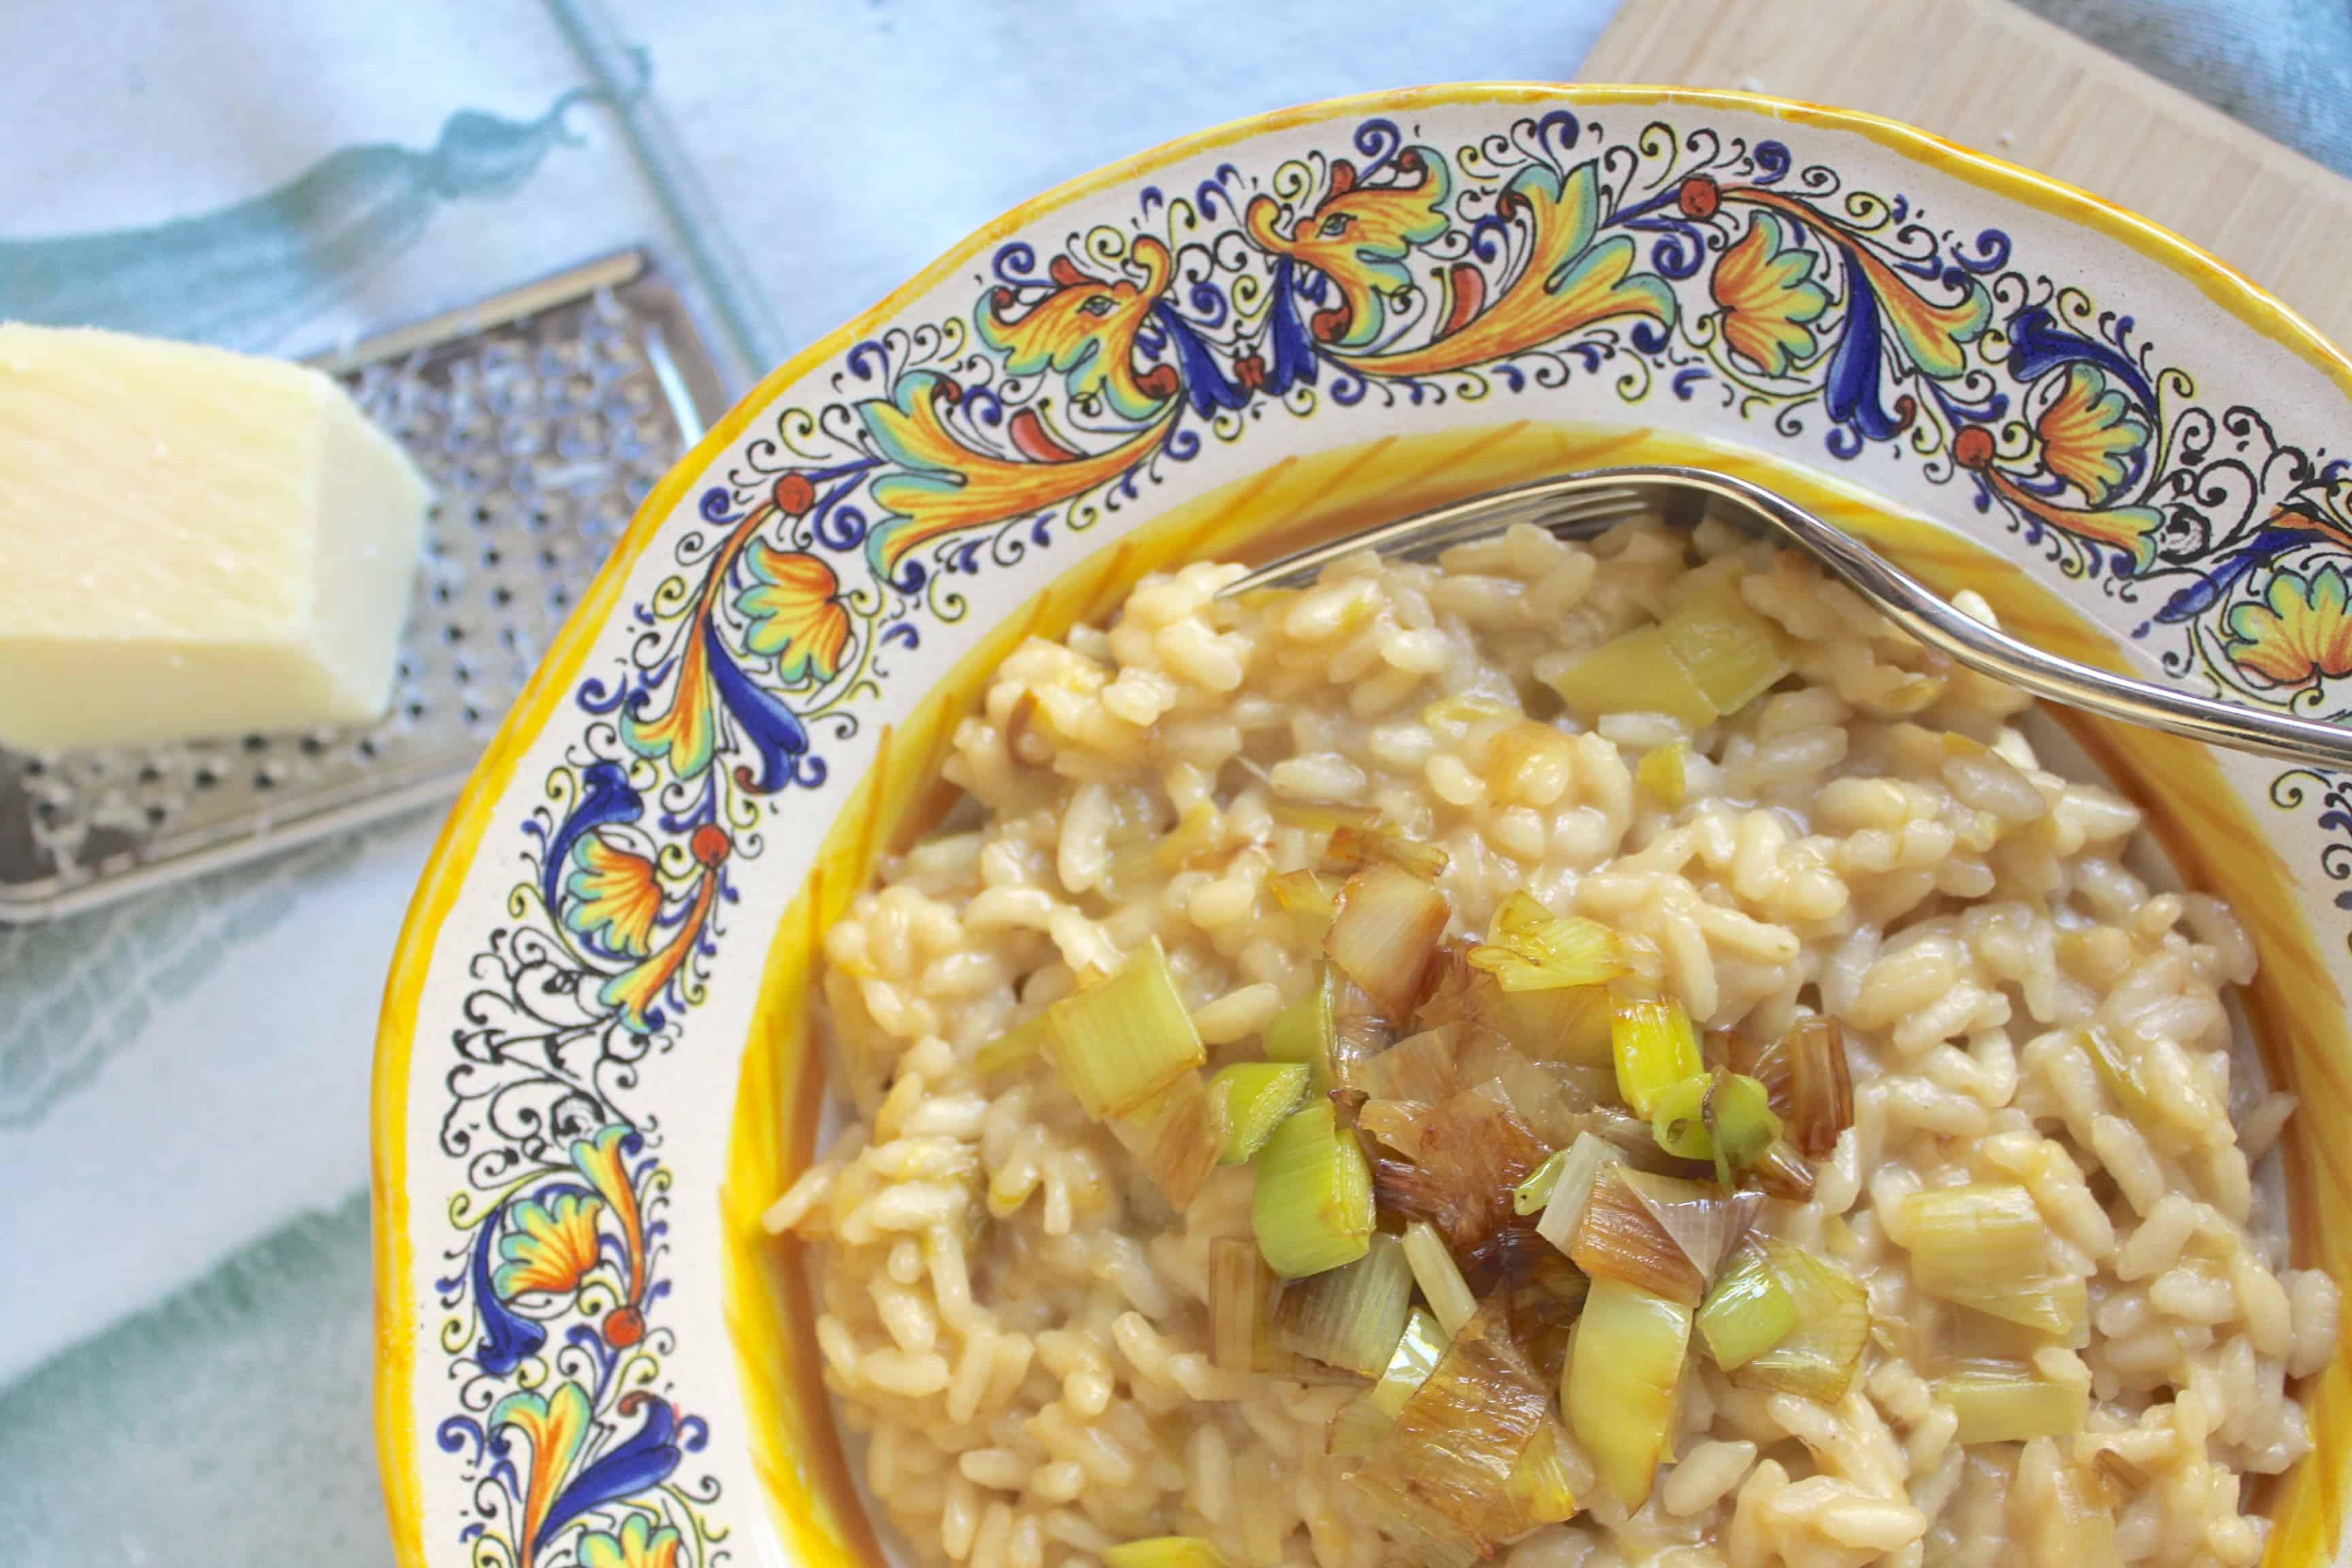 Leek and Pecorino risotto by Christina's Cucina